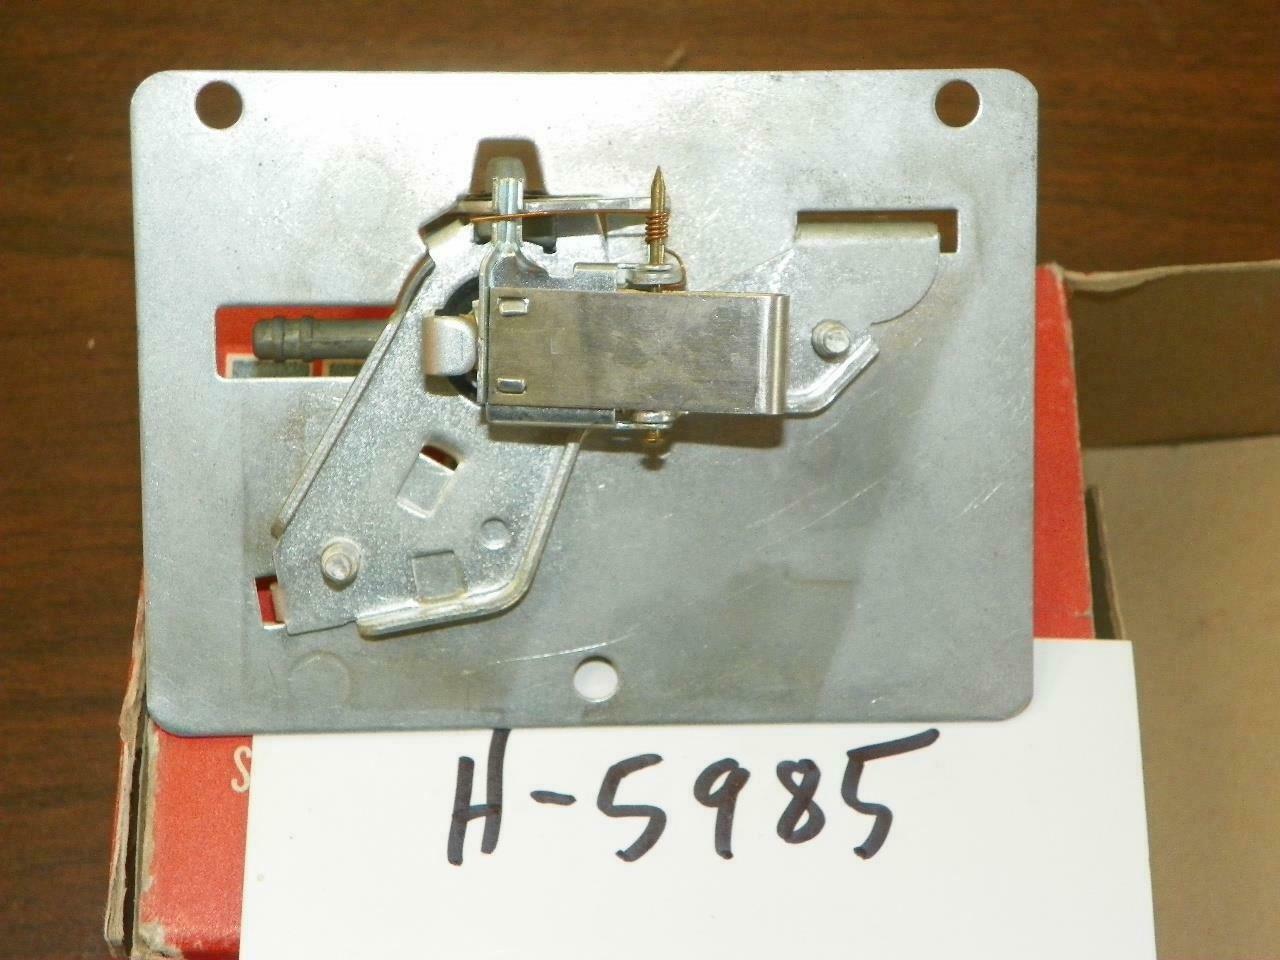 Heater Temperature Sensing Unit 1958 Oldsmobile, Everhot H5985, OEM 573676, NOS